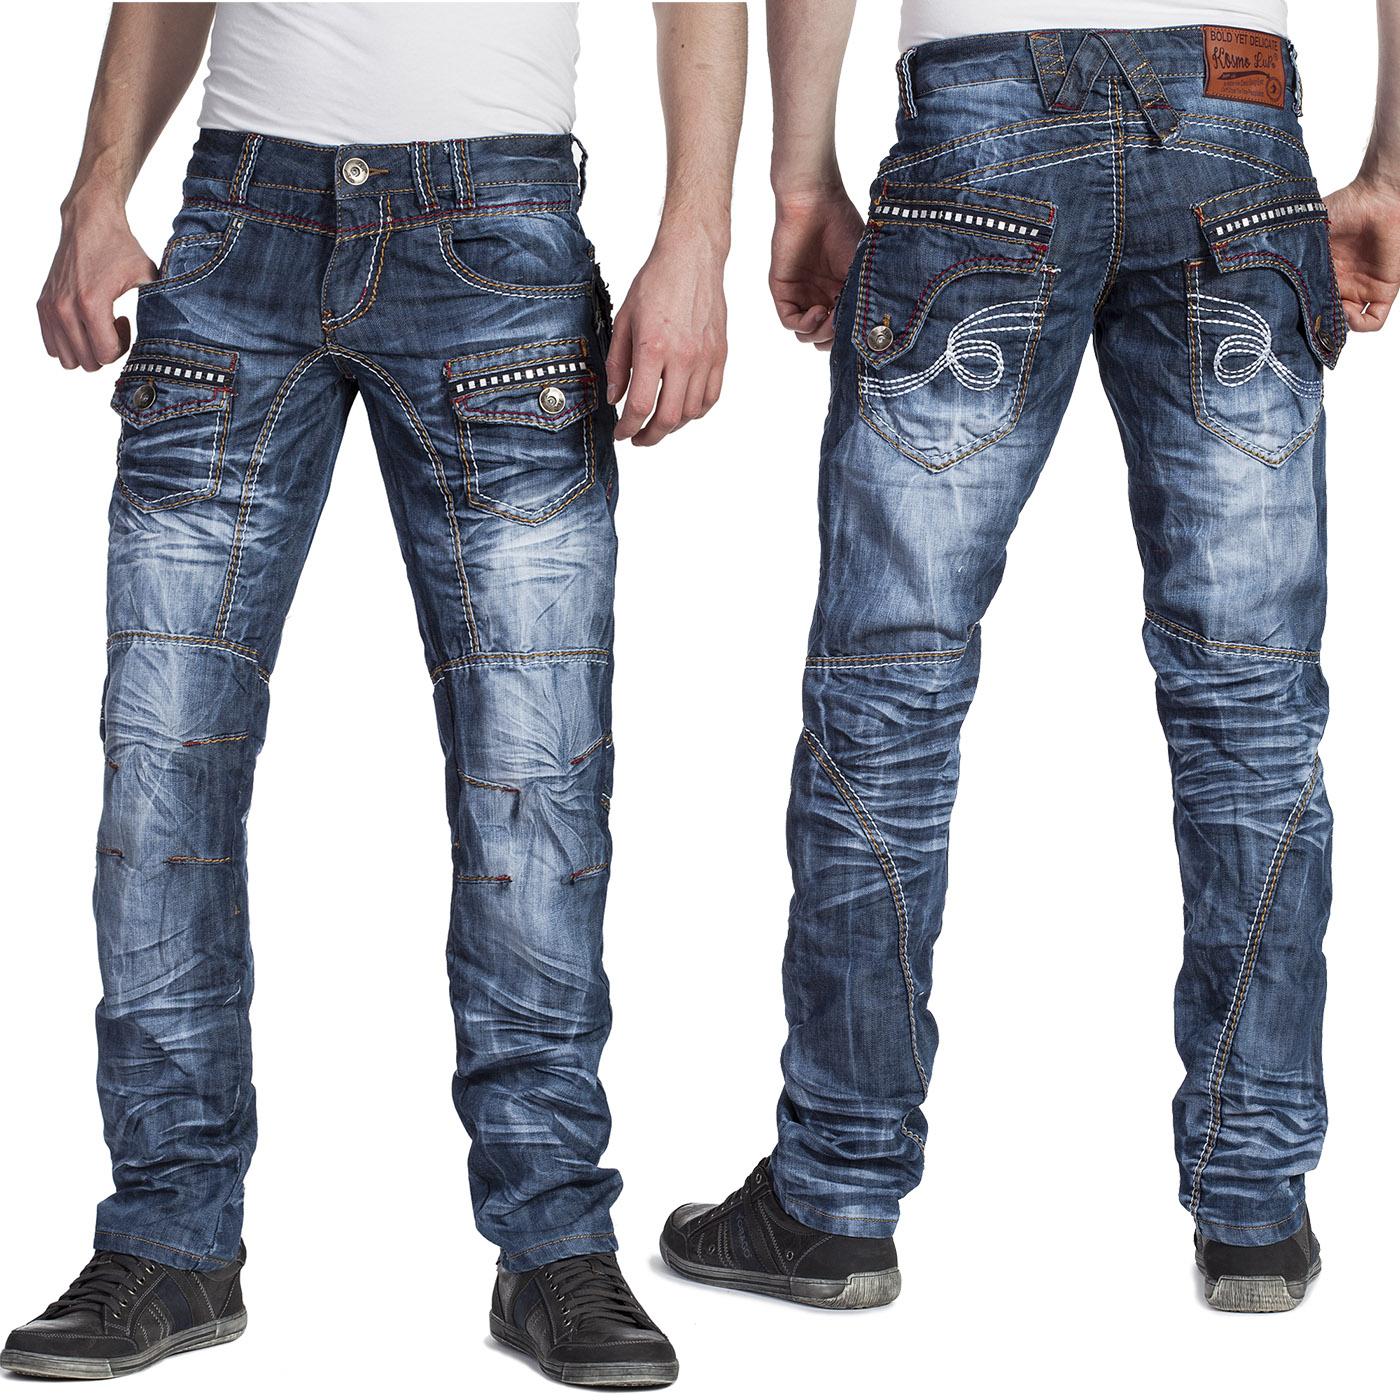 kosmo lupo herren jeans hose dicke doppel n hte und nieten. Black Bedroom Furniture Sets. Home Design Ideas